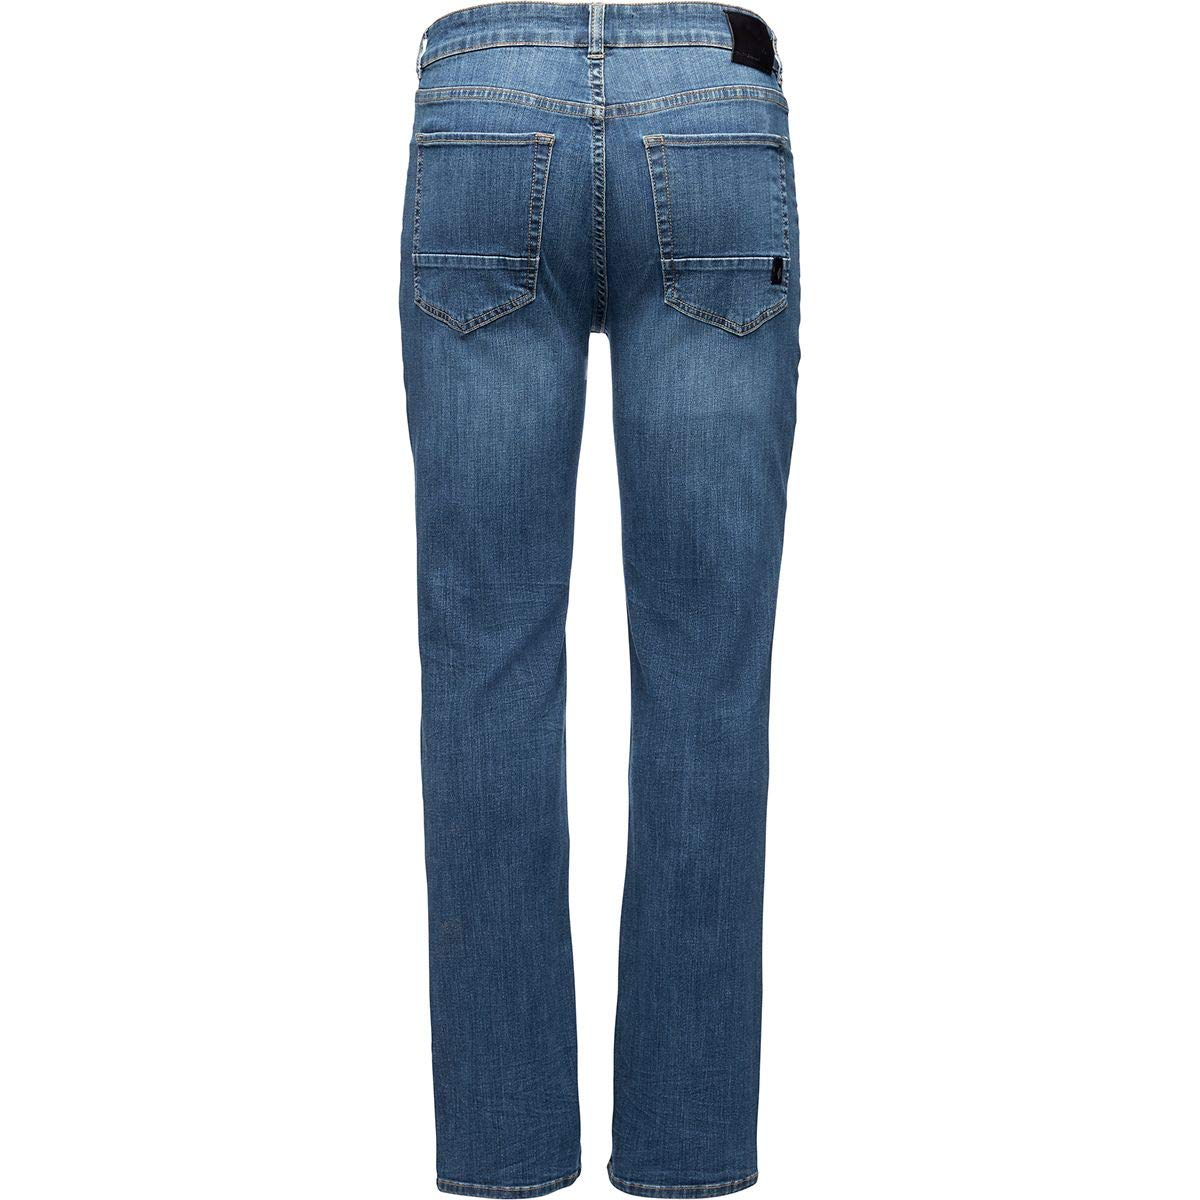 9b7c4a91d445d Amazon.com : Black Diamond Forged Denim Pant - Men's : Clothing